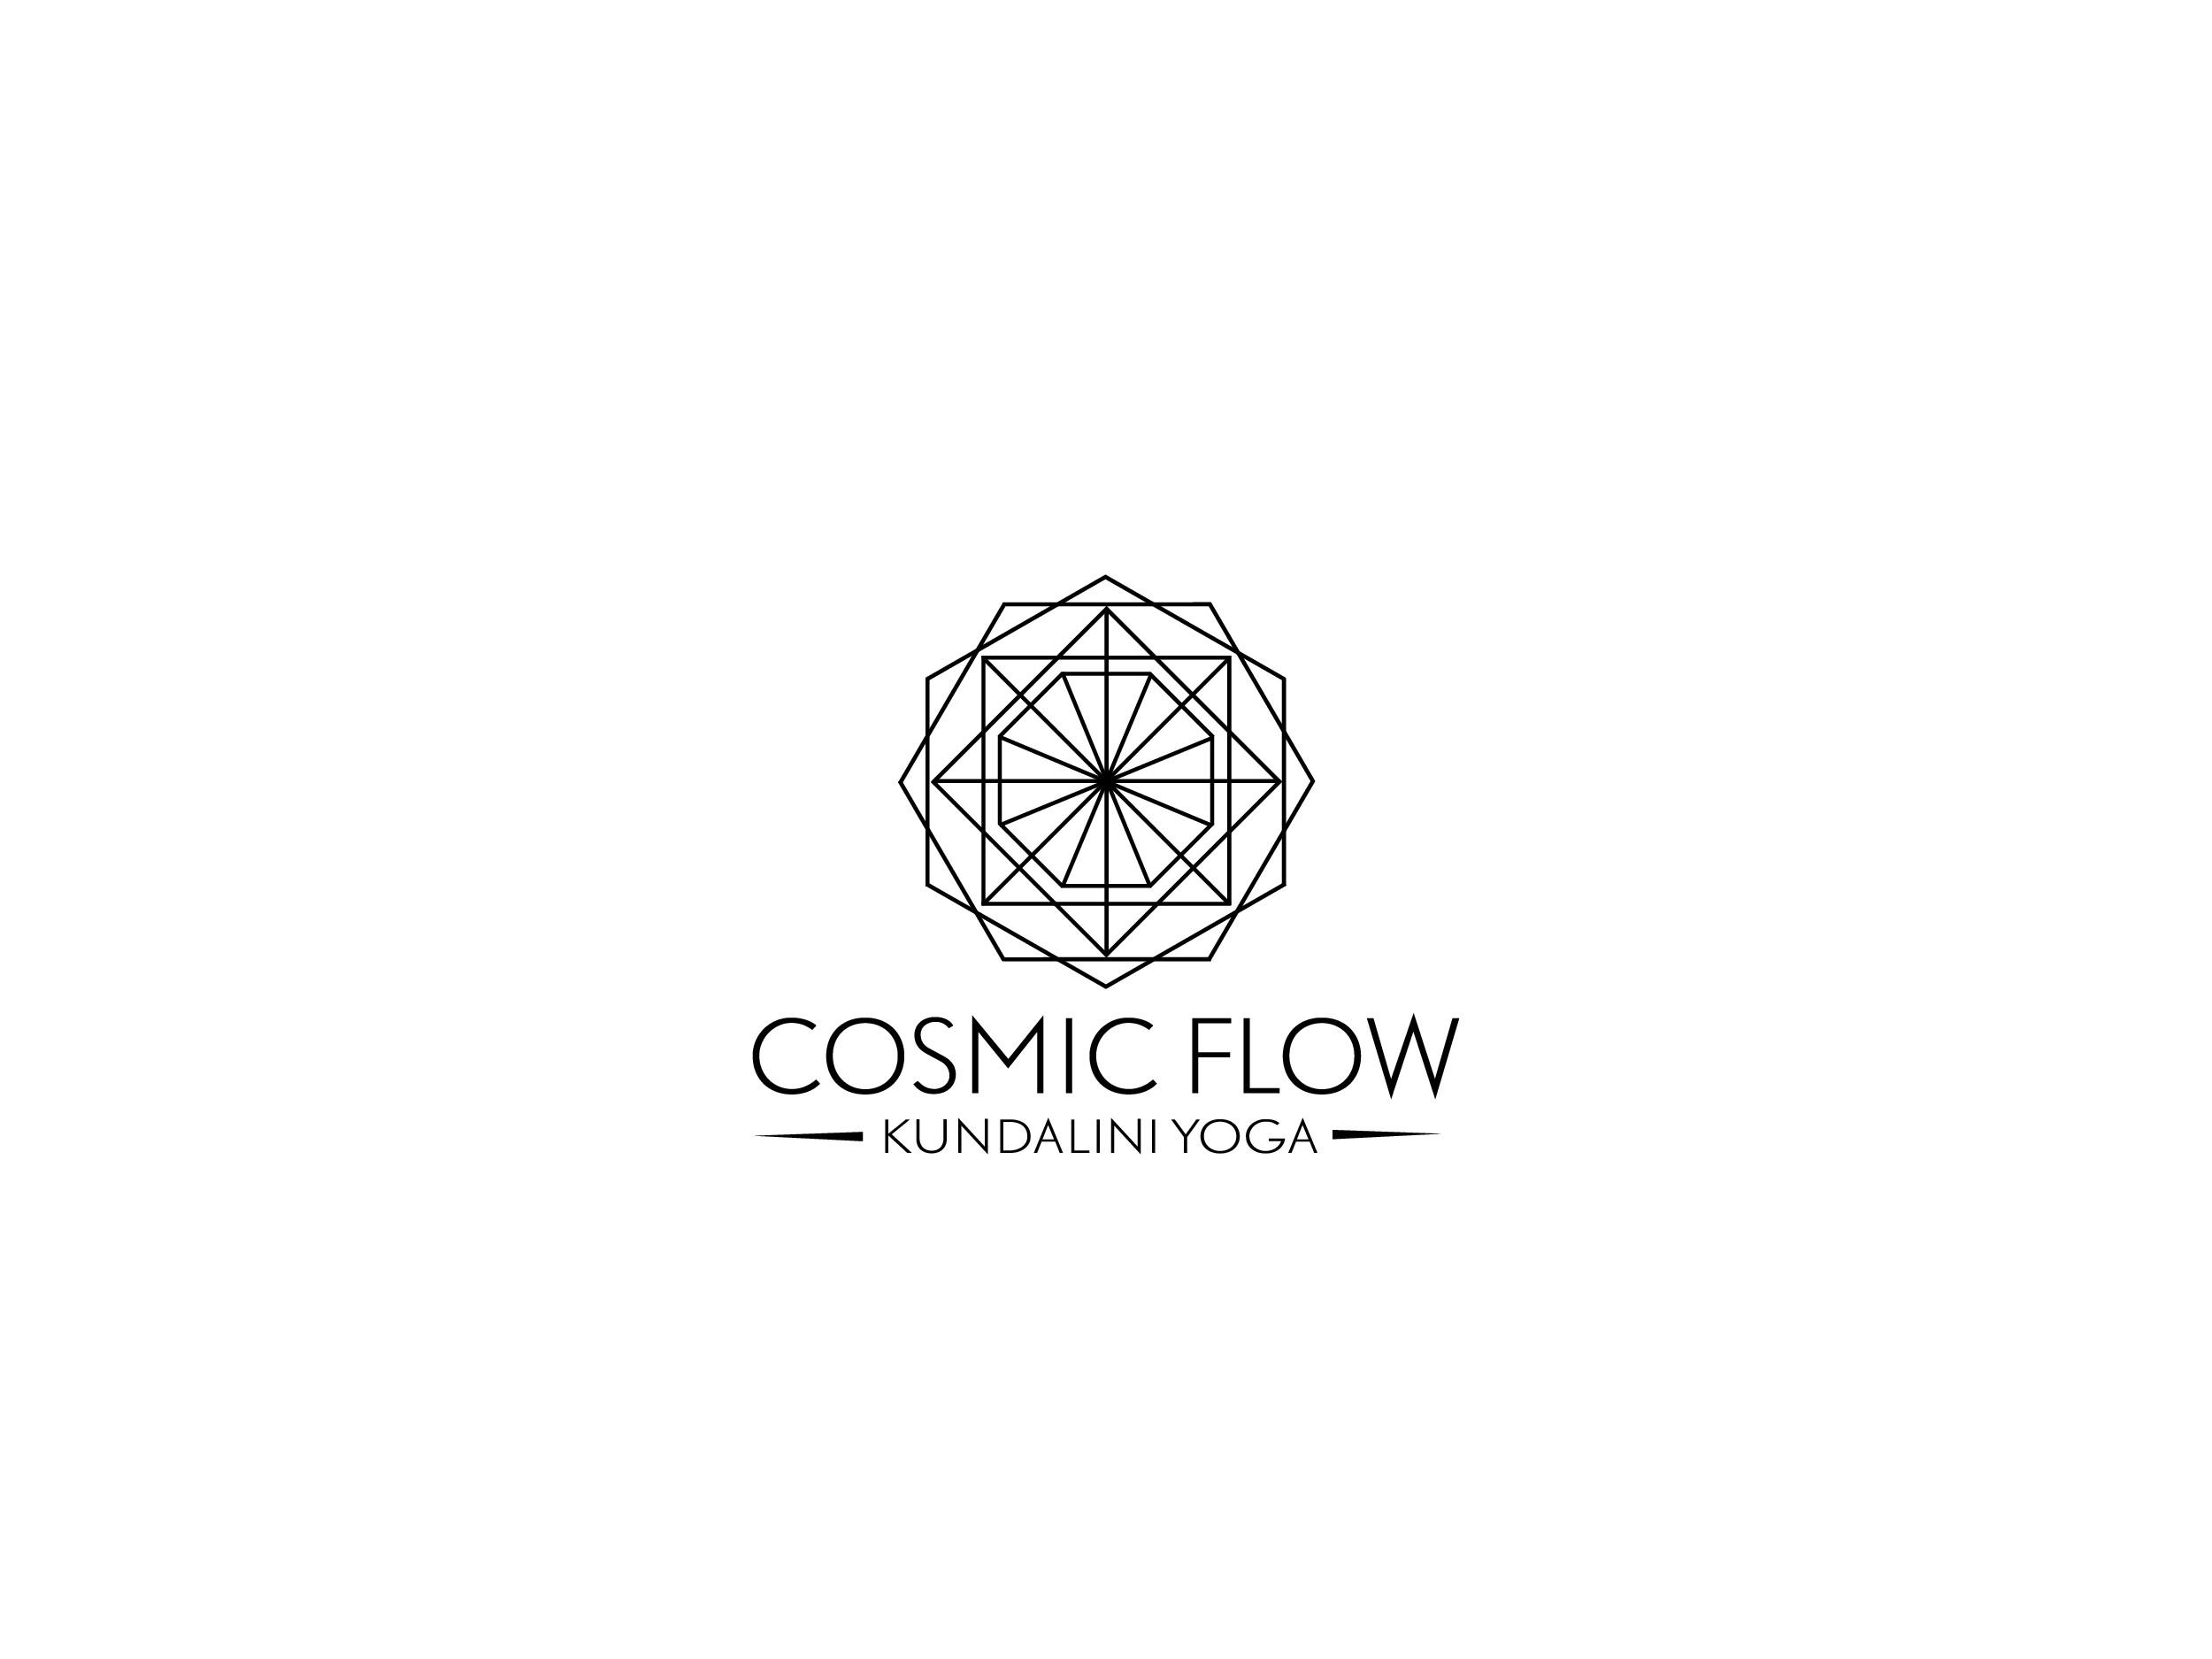 New logo for a kundalini yoga center